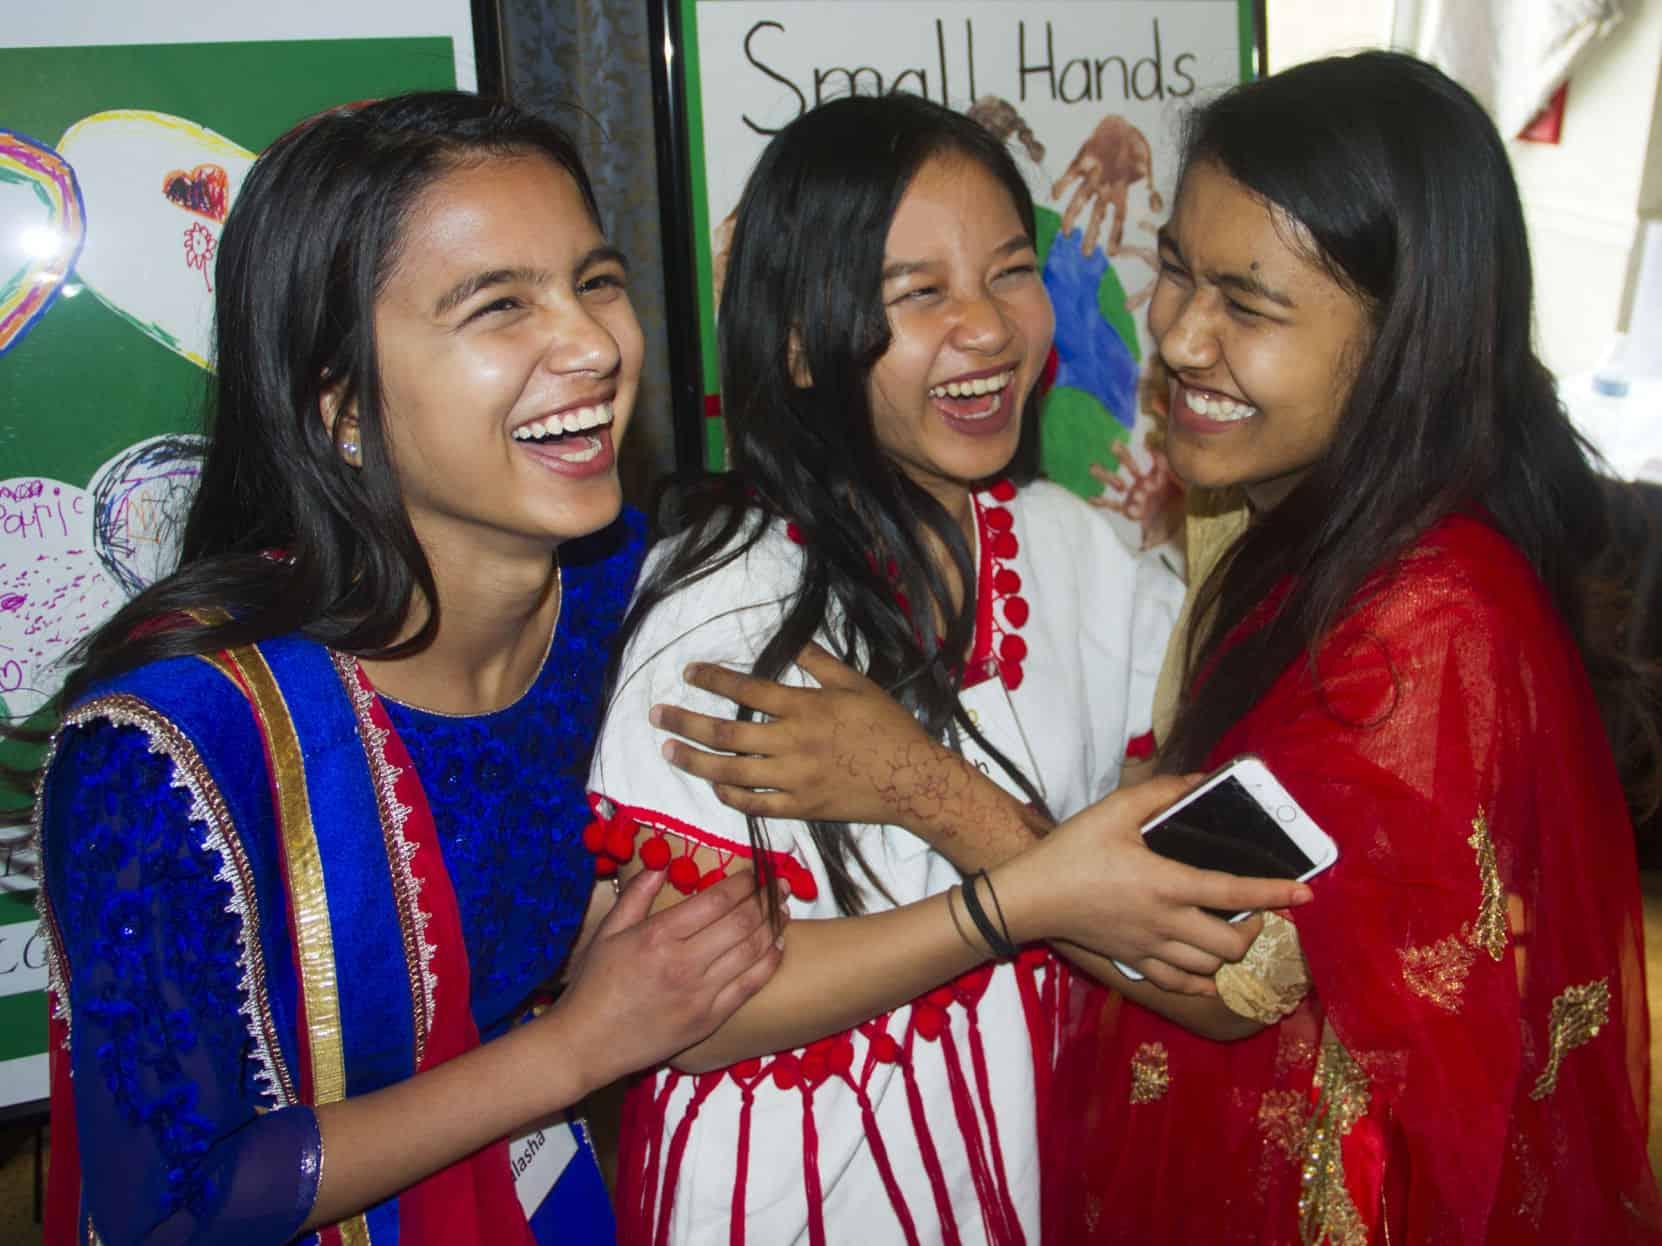 SHIM celebrates 50 years of 'neighbors helping neighbors'